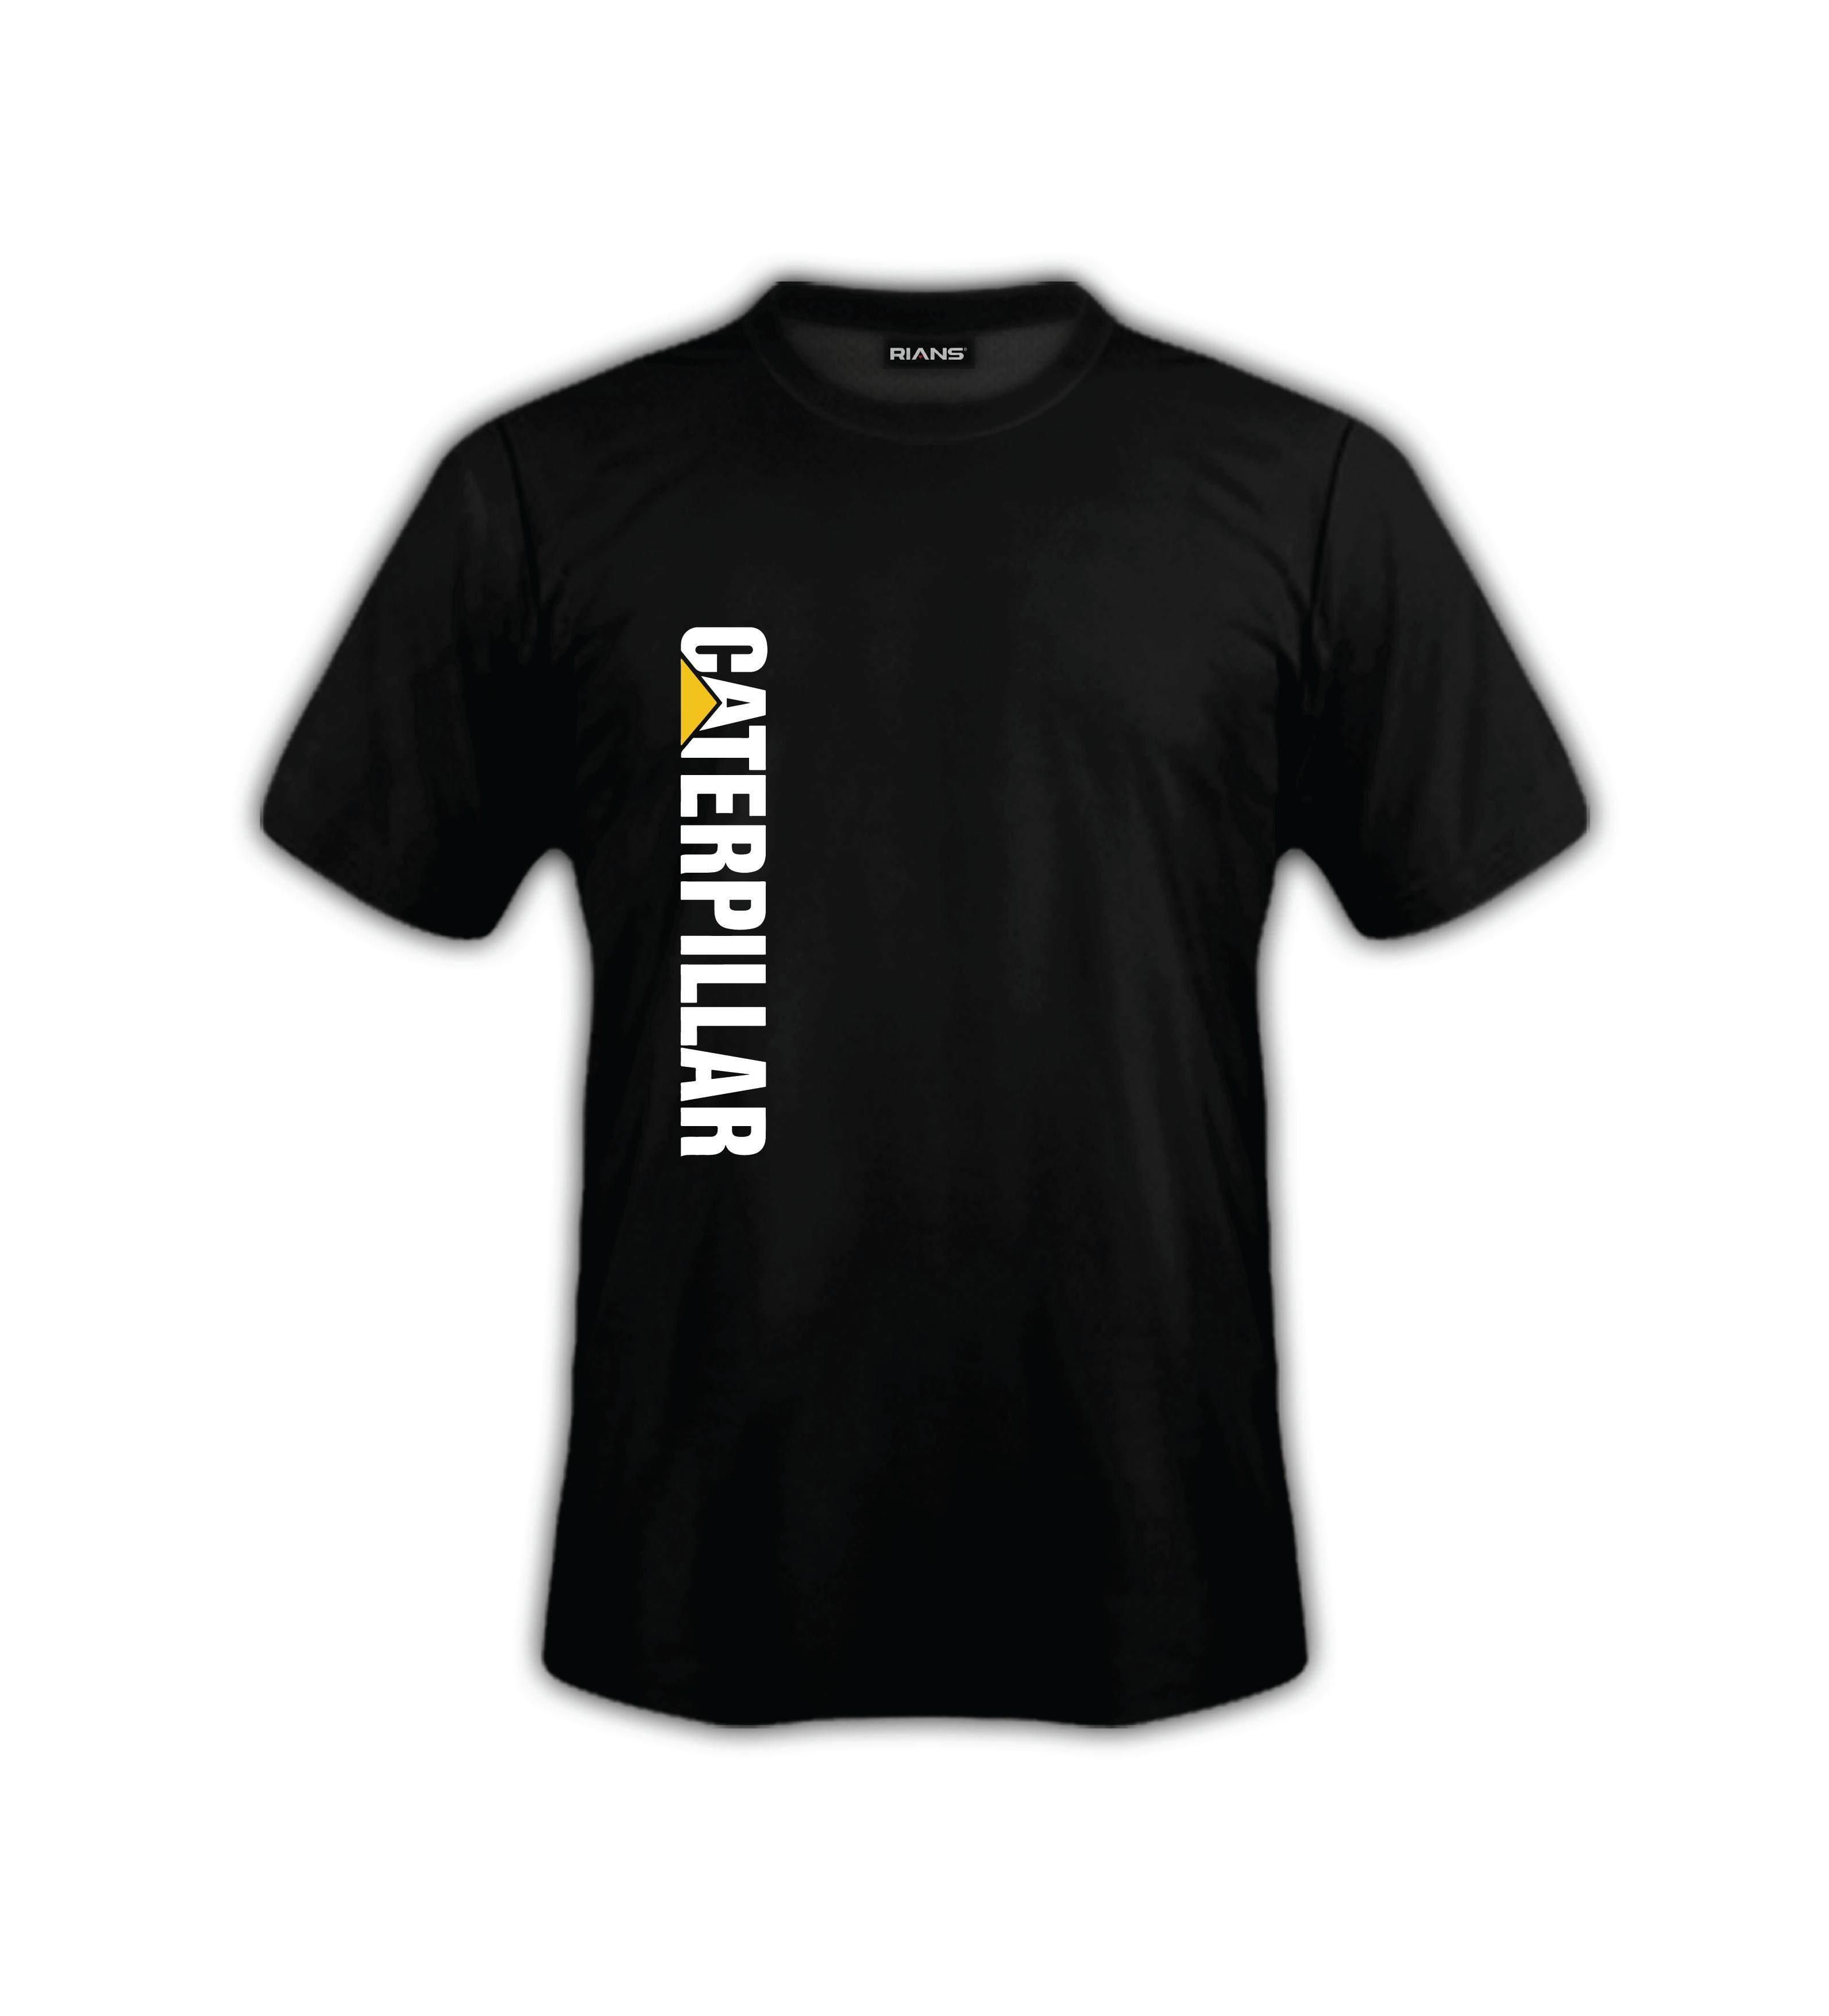 T-Shirt CATERPILLAR Right Down Text 100% Cotton Baju Tshirt Black White Hitam Putih Bossku